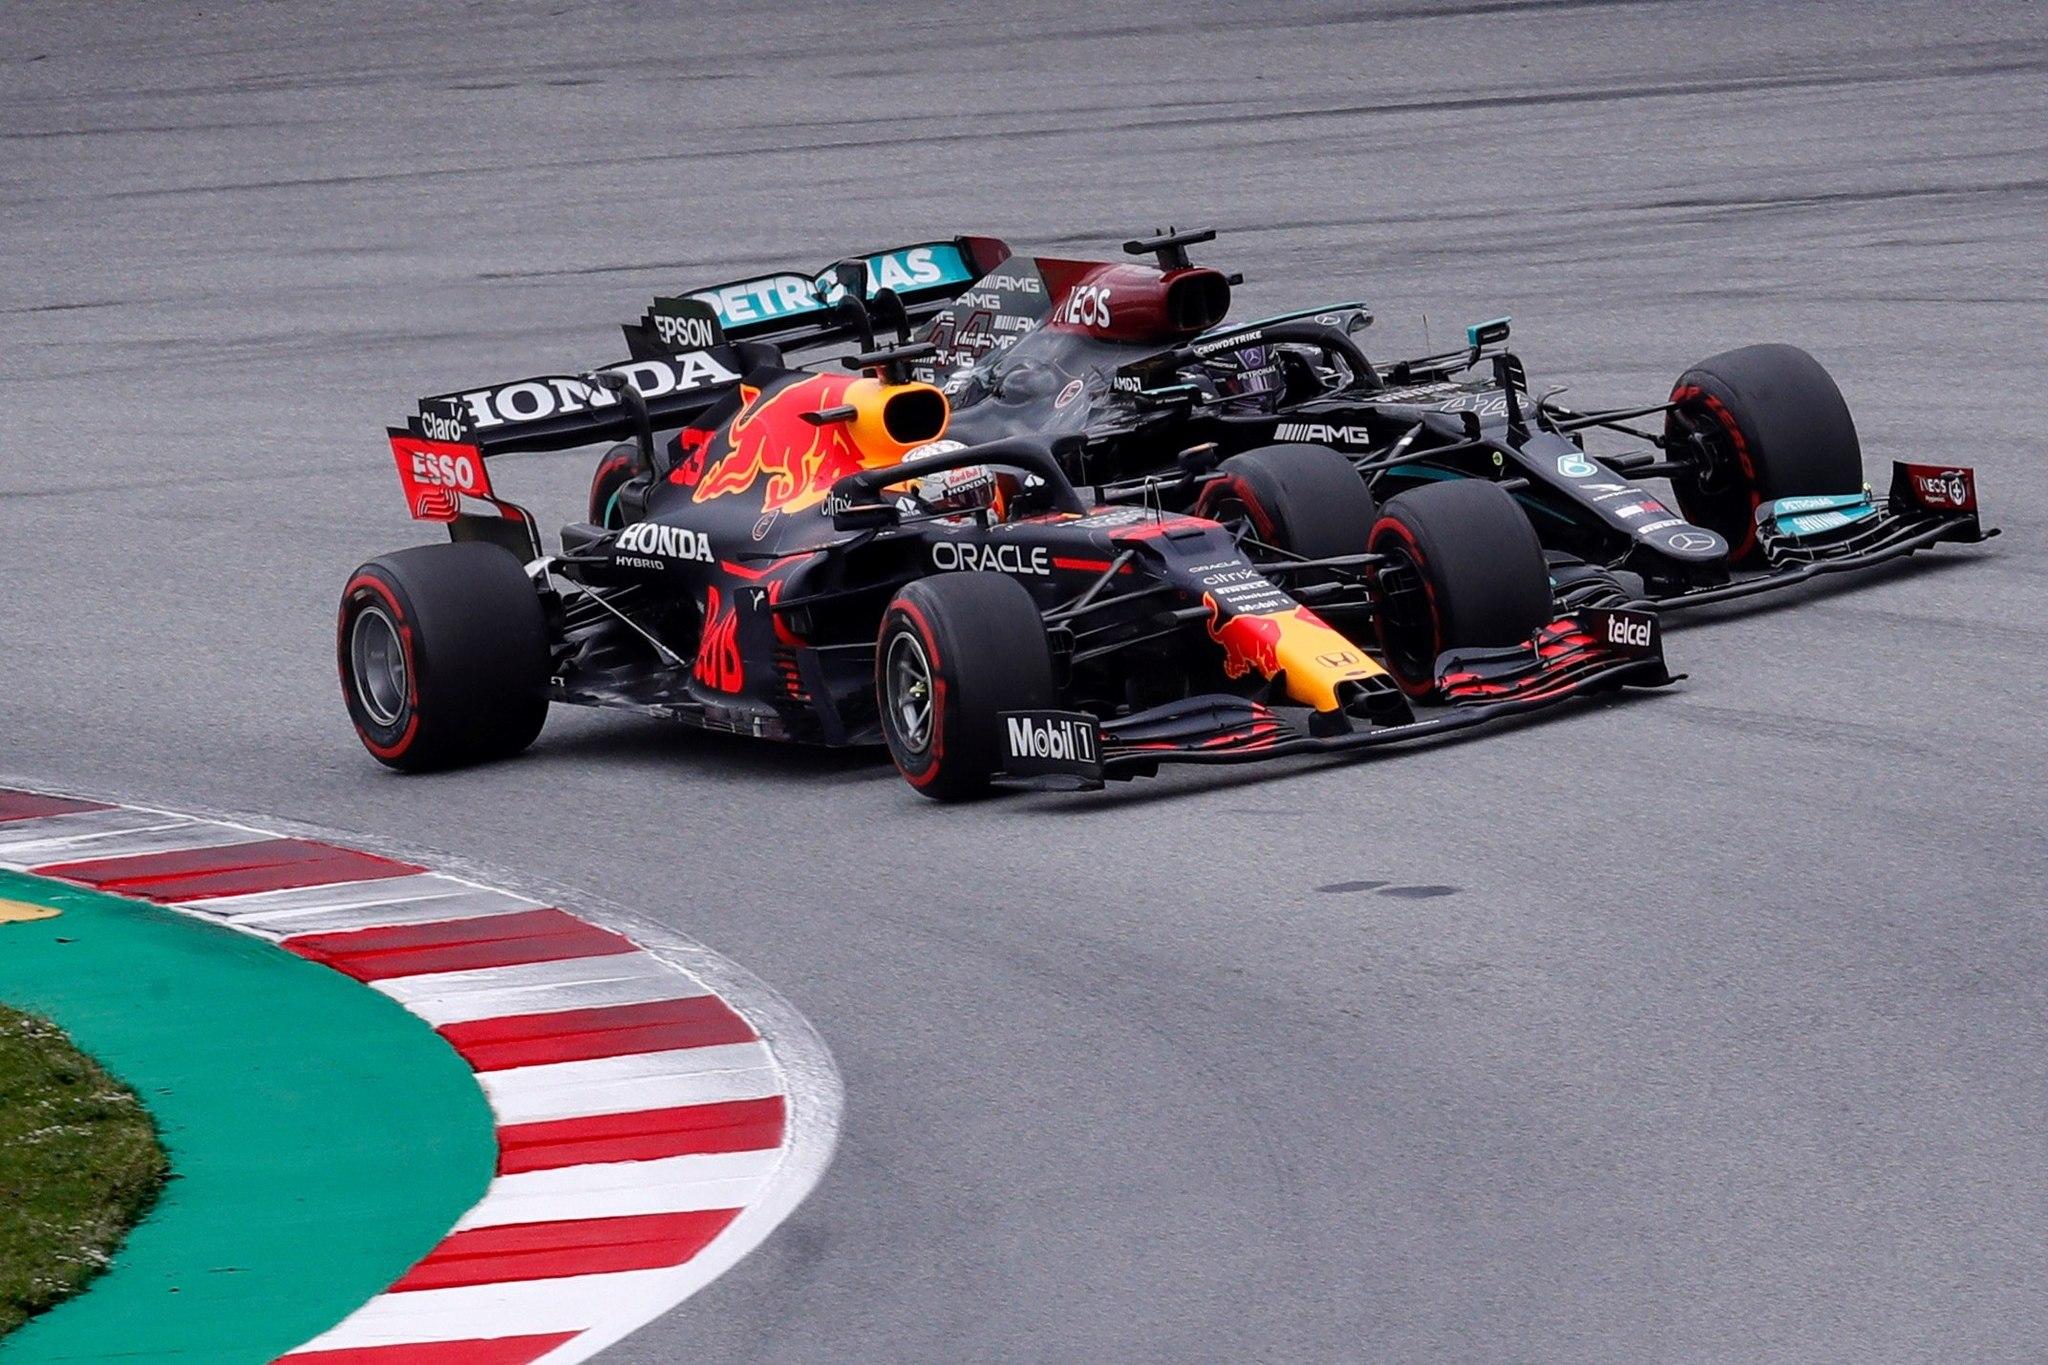 GRAFCAT2891. MONTMELO (BARCELONA), 09/05/2021.- El piloto neerlandés de Red Bull Max lt;HIT gt;Verstappen lt;/HIT gt; (i) adelanta al británico de Mercedes Lewis lt;HIT gt;Hamilton lt;/HIT gt; (d) en la primera curva del Gran Premio de España de Formula Uno que se disputa este domingo en del Circuito de Barcelona-Cataluña. EFE/Alejandro García